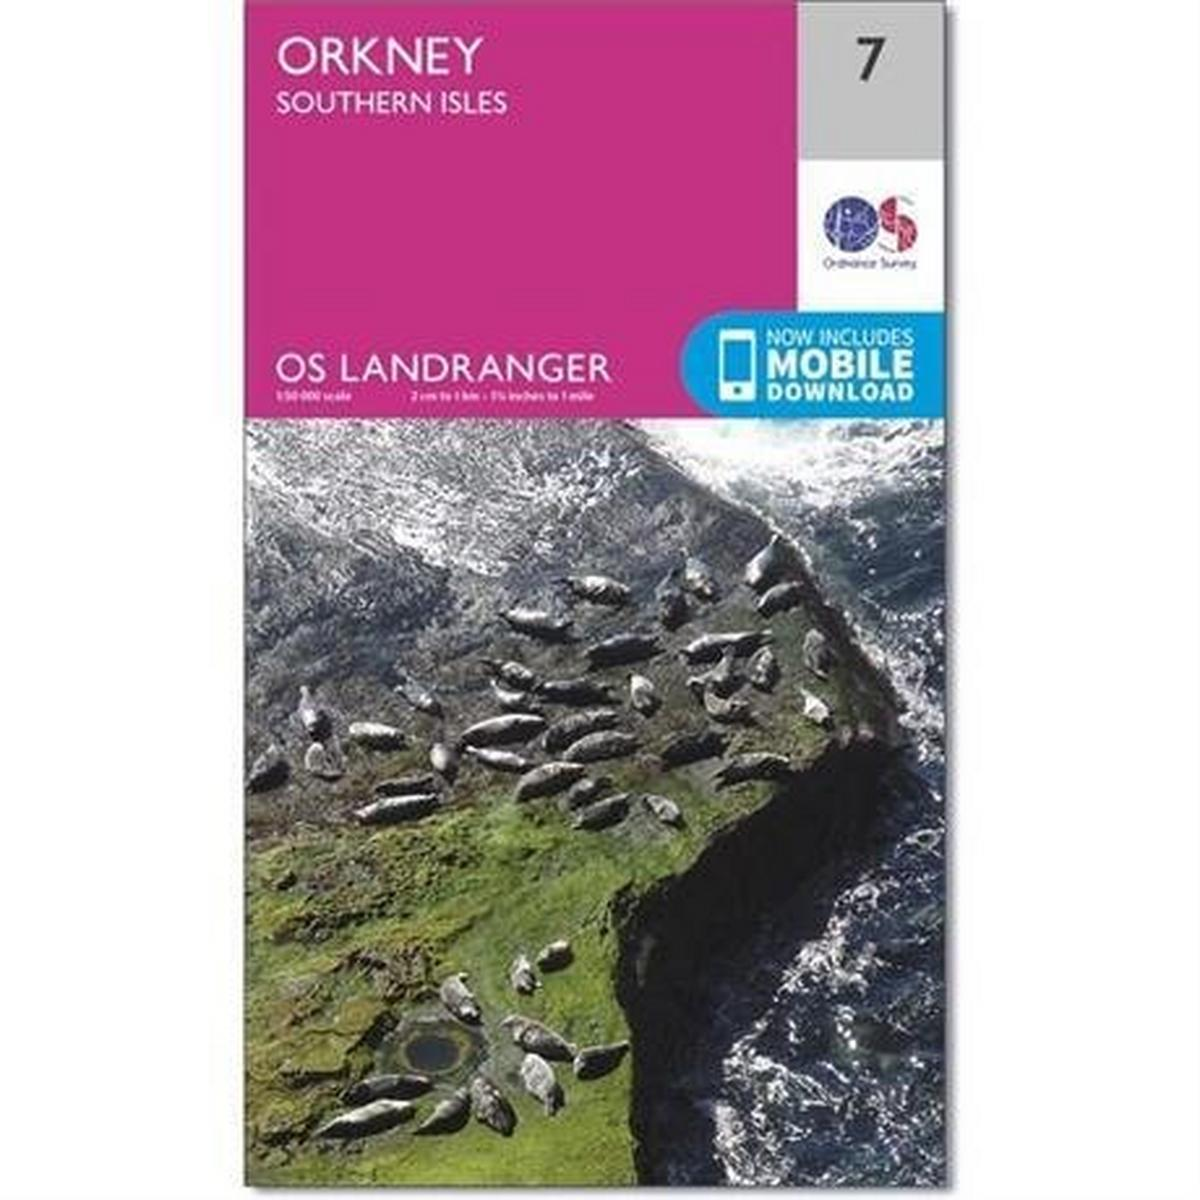 Ordnance Survey OS Landranger Map 07 Orkney - Southern Isles